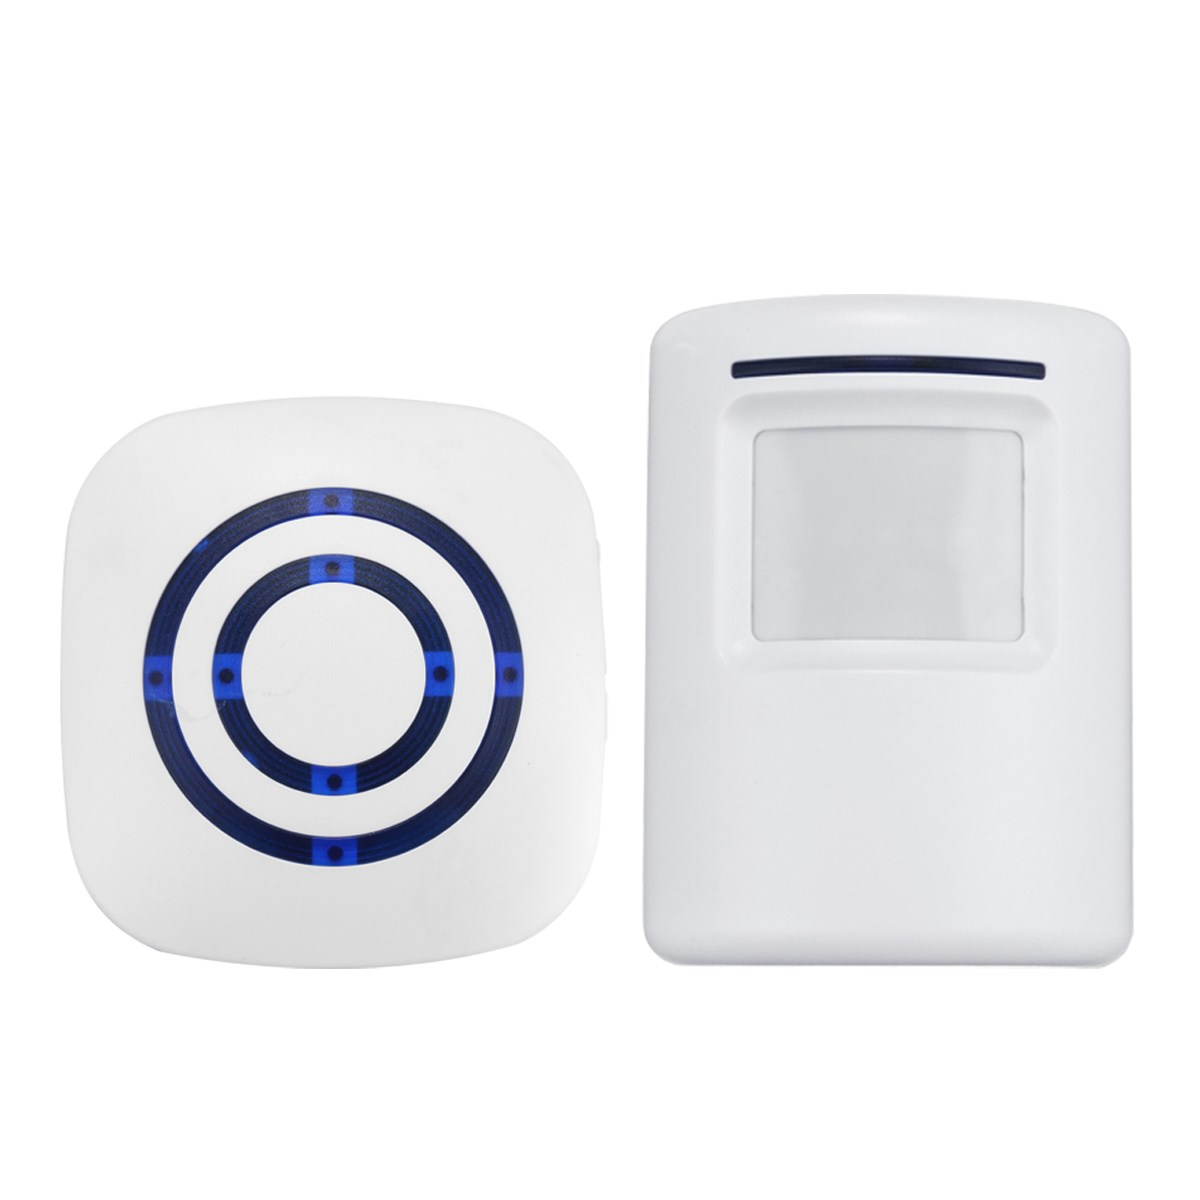 все цены на Safurance Wireless Motion Sensor Detector Gate Entry Door Bell Welcome Chime Alert Alarm Home Automation Home Security